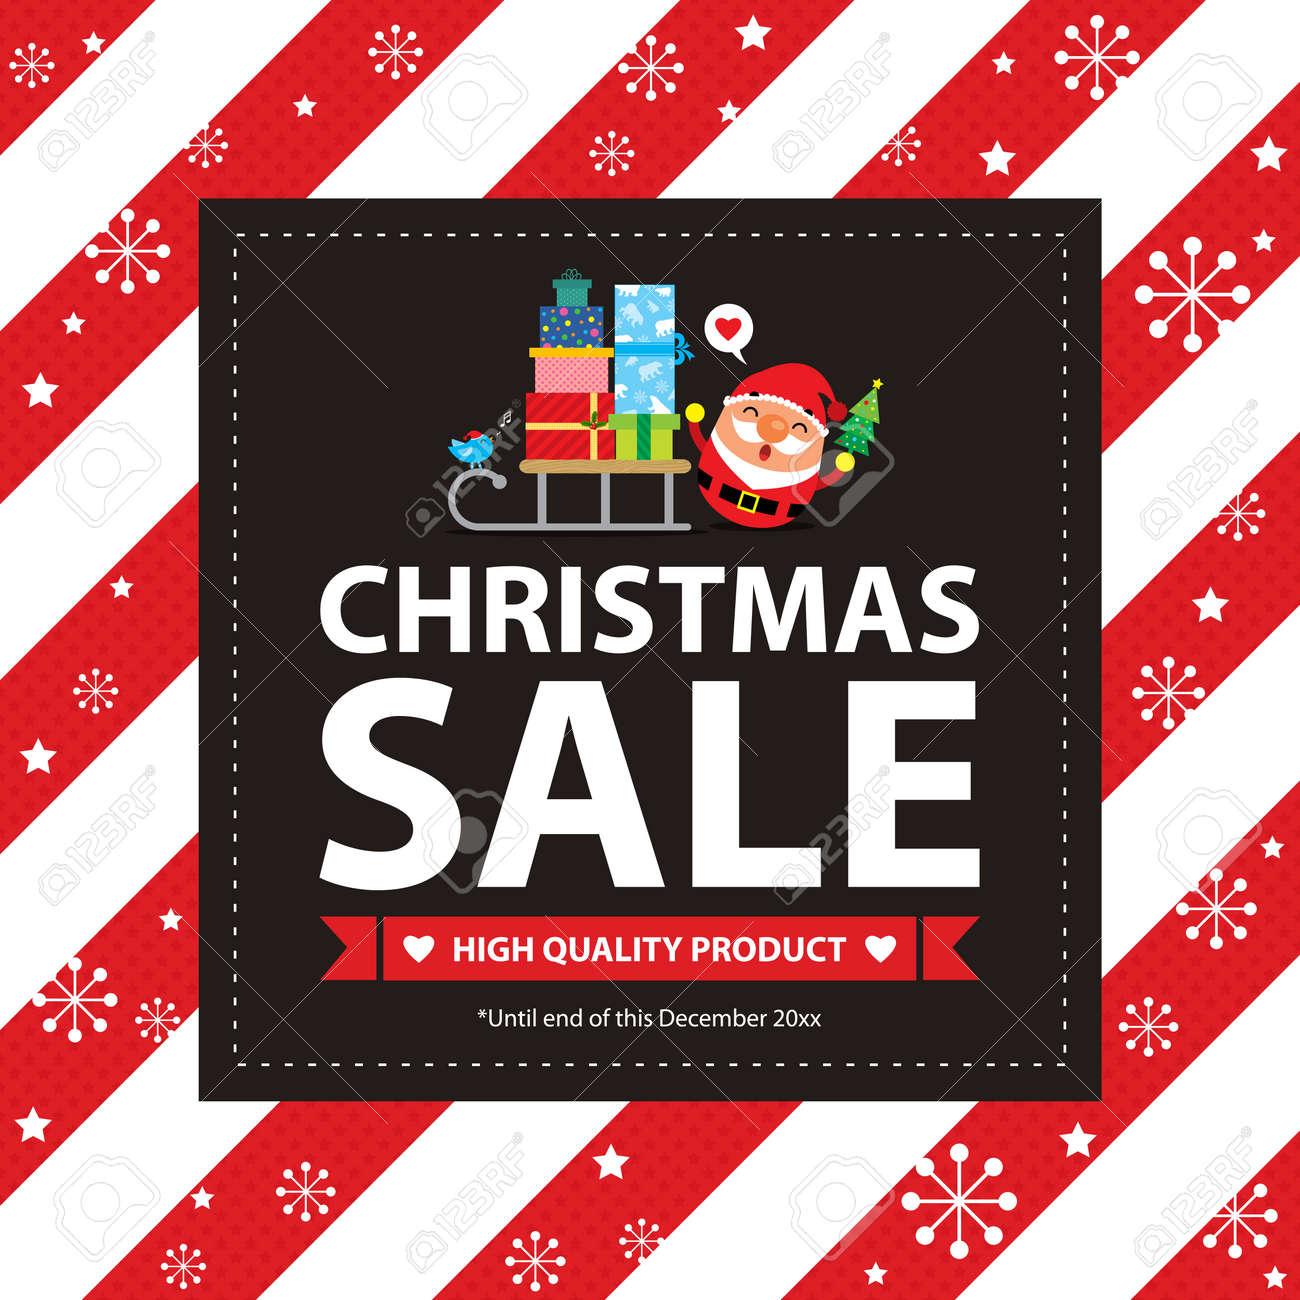 Christmas Sale Card - 46483635